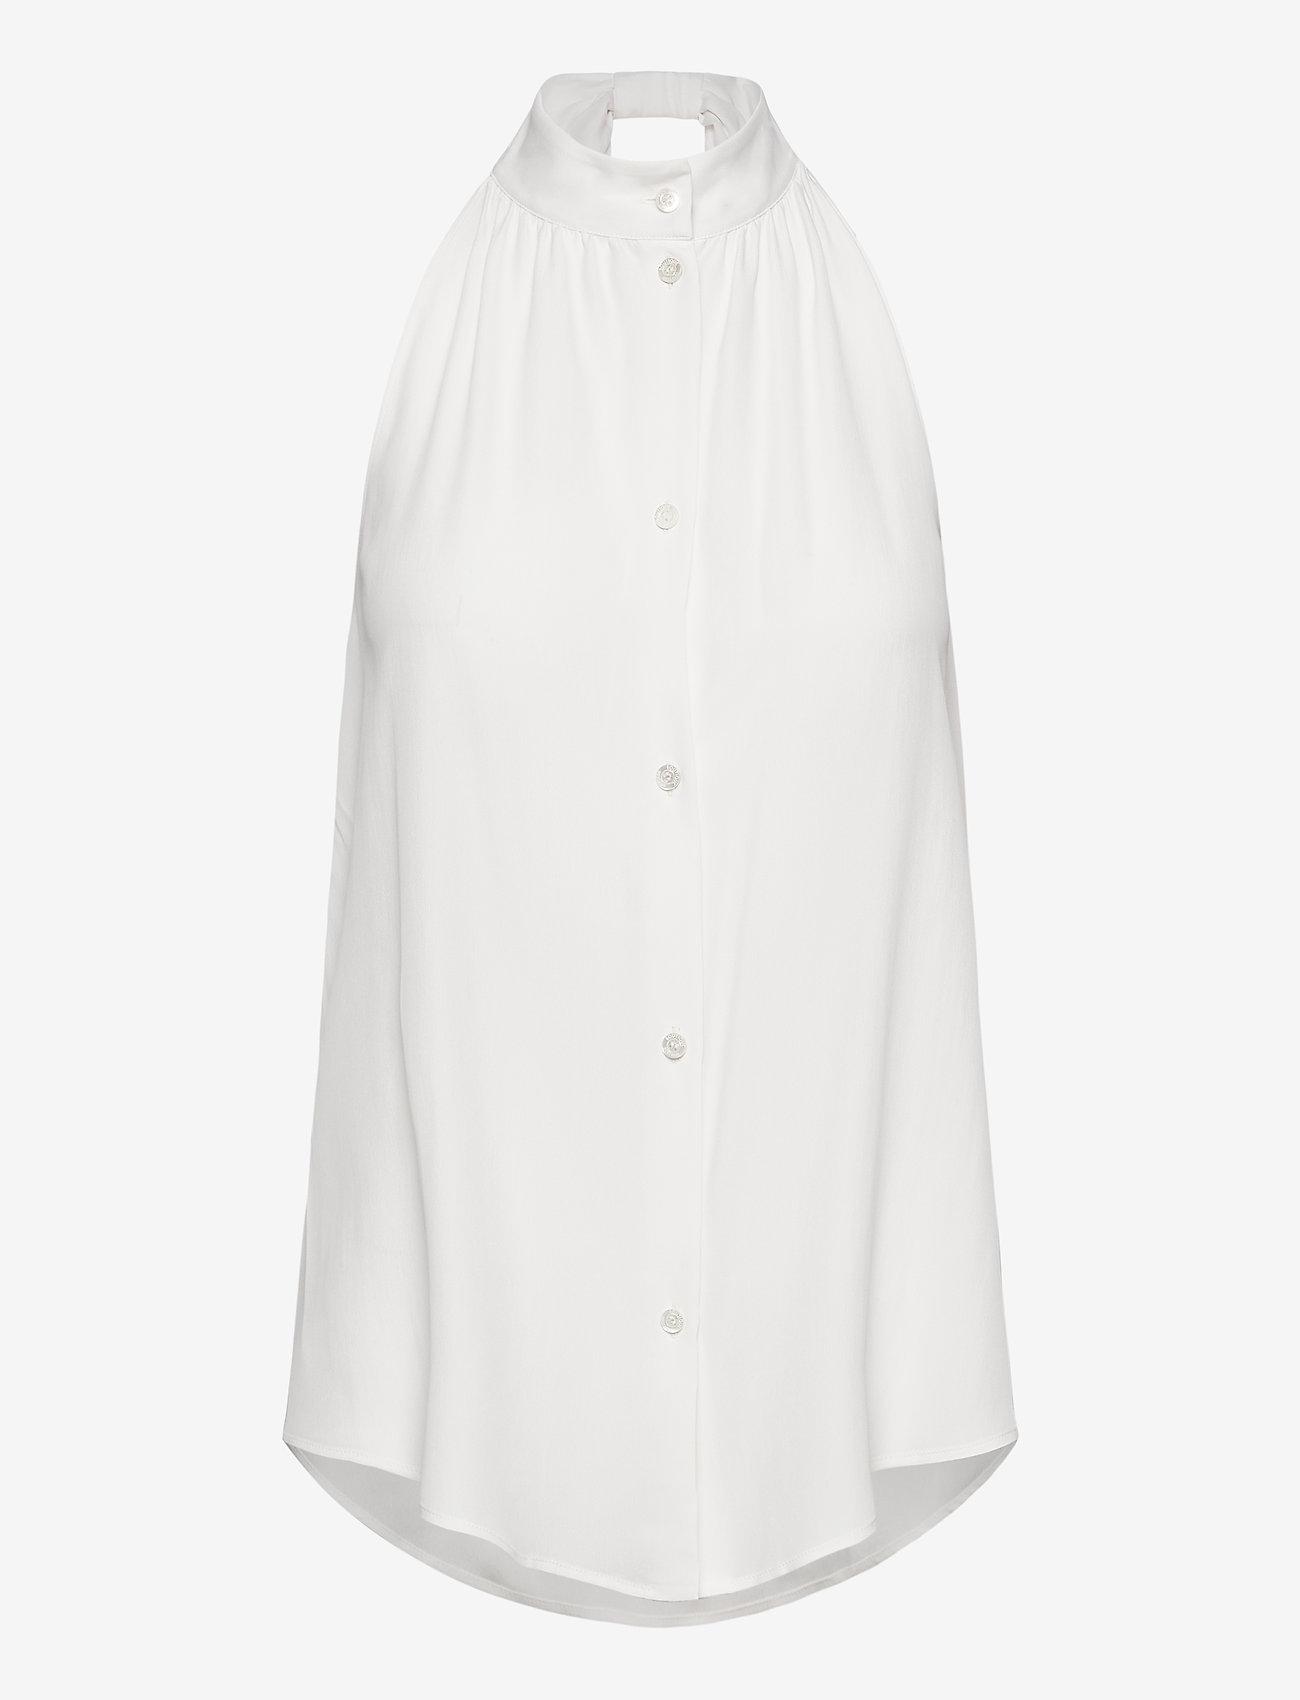 Boutique Moschino - Boutique Moschino BLOUSE - Ærmeløse bluser - white - 0